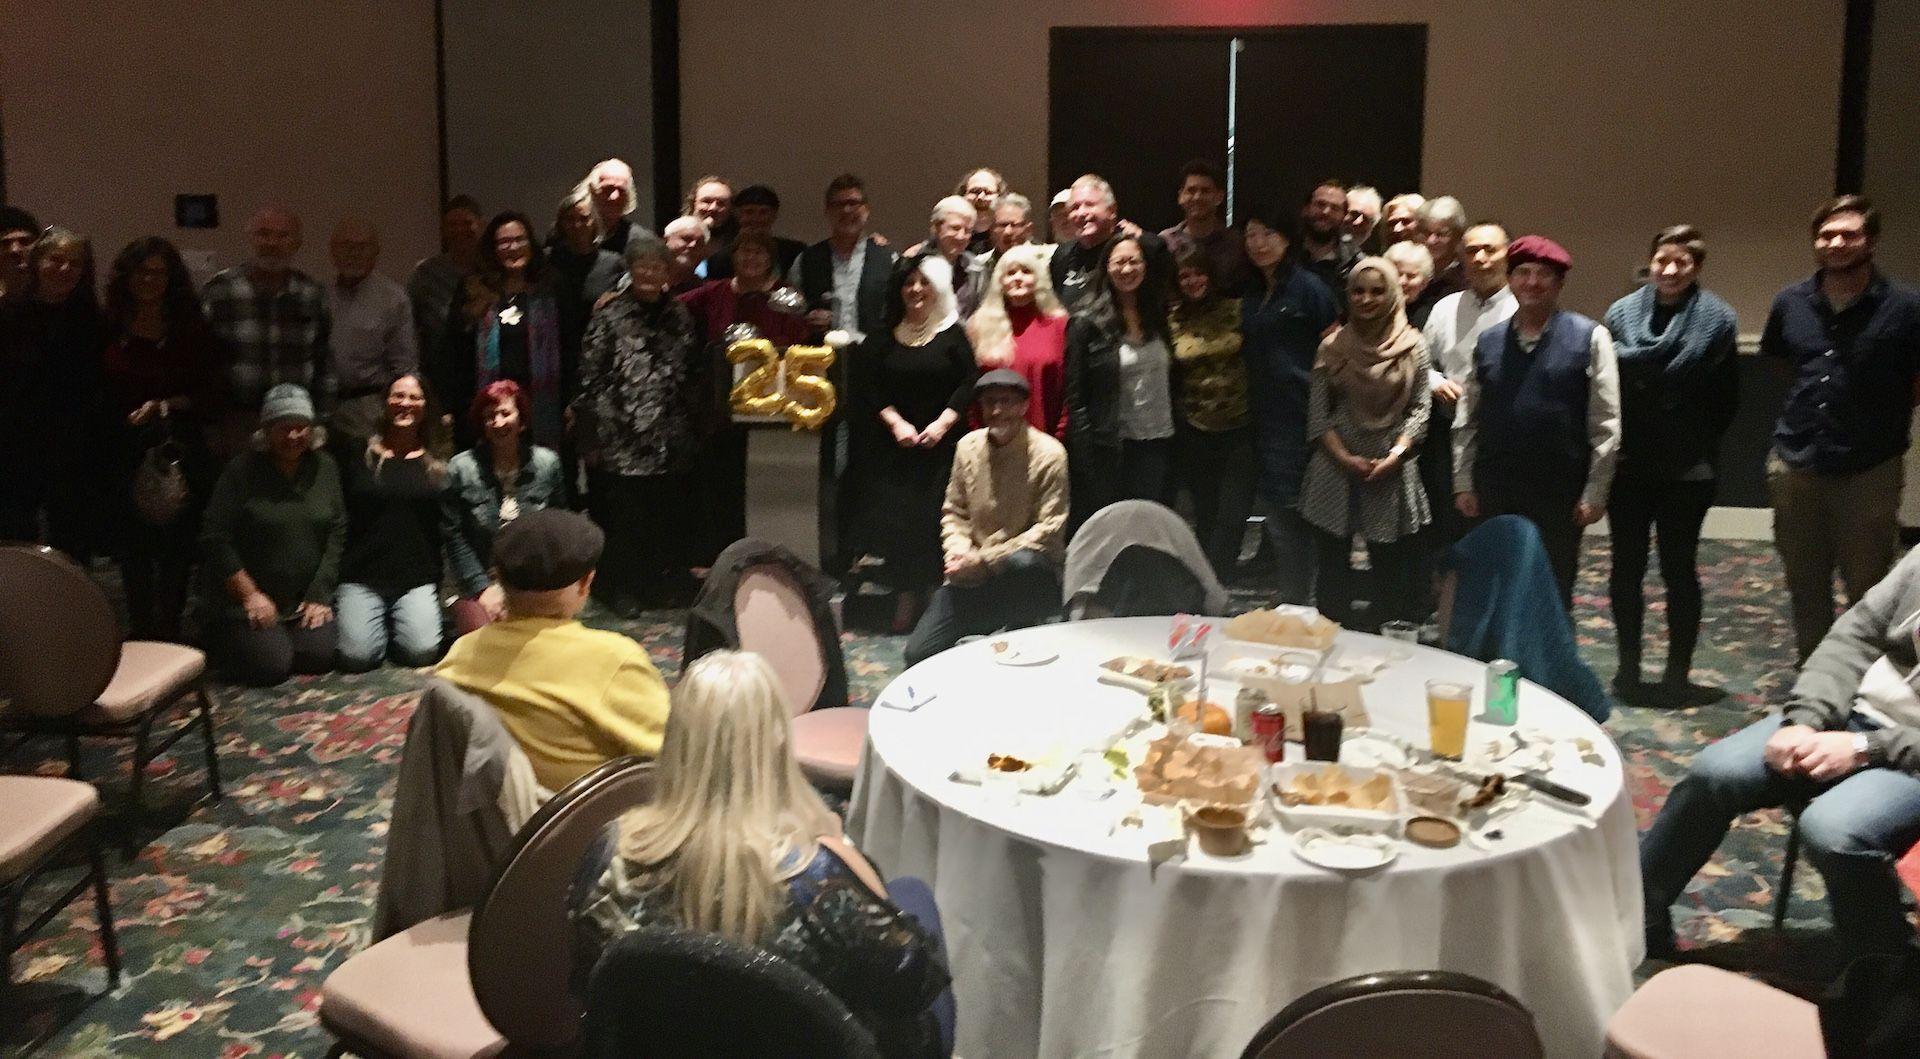 Group photo at OPWC's 25th Anniversary Extraganza